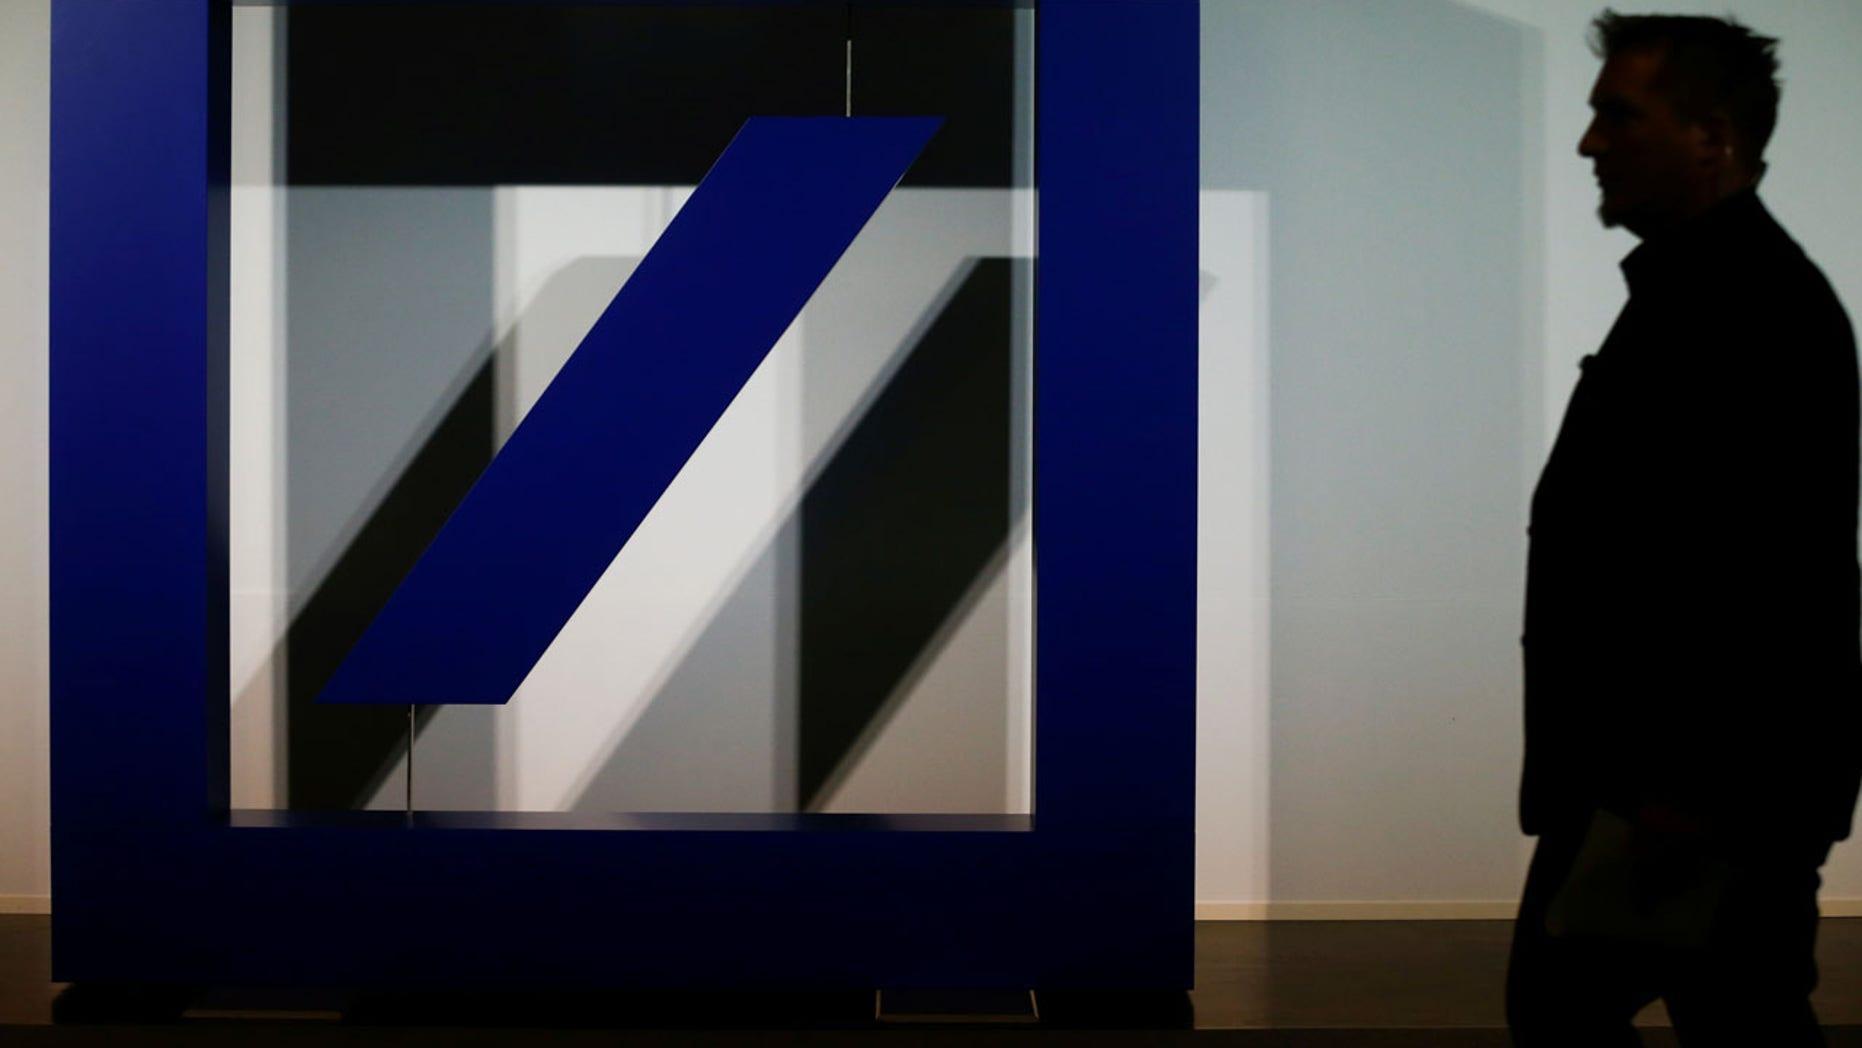 Deutsche Bank is a major correspondent bank for U.S. dollar transactions around the world.